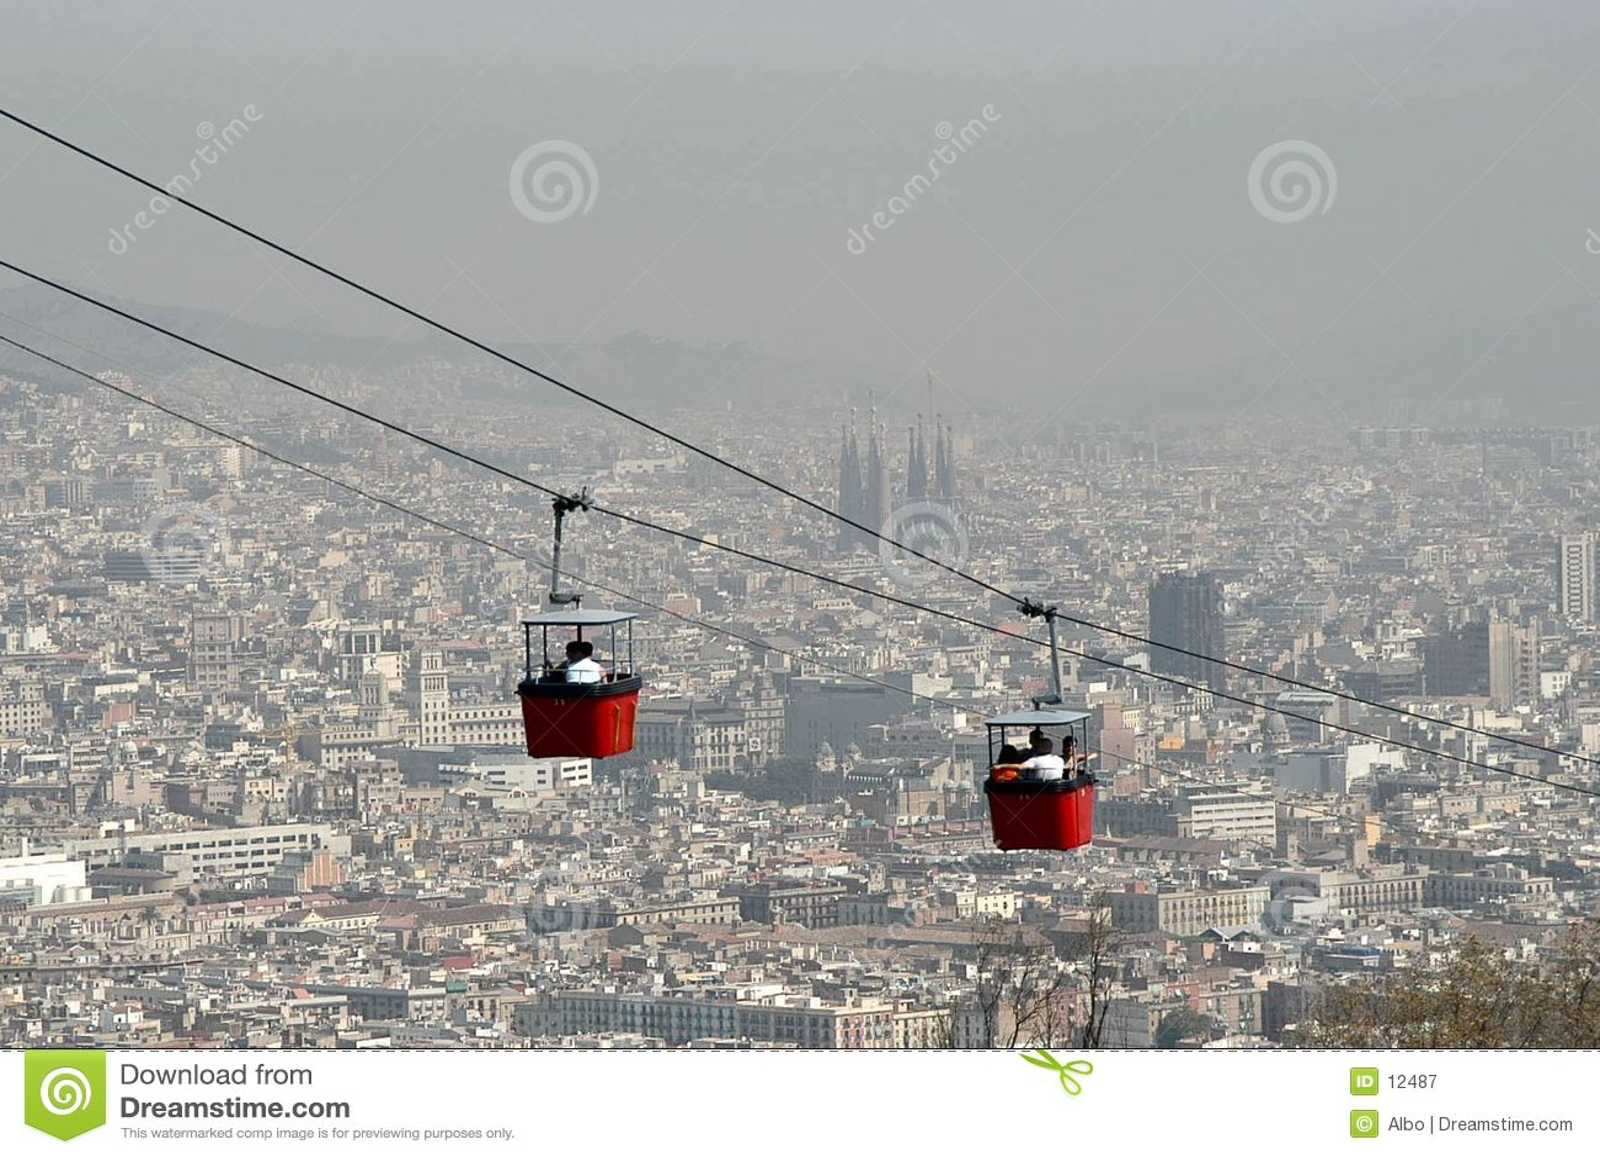 Cable railways